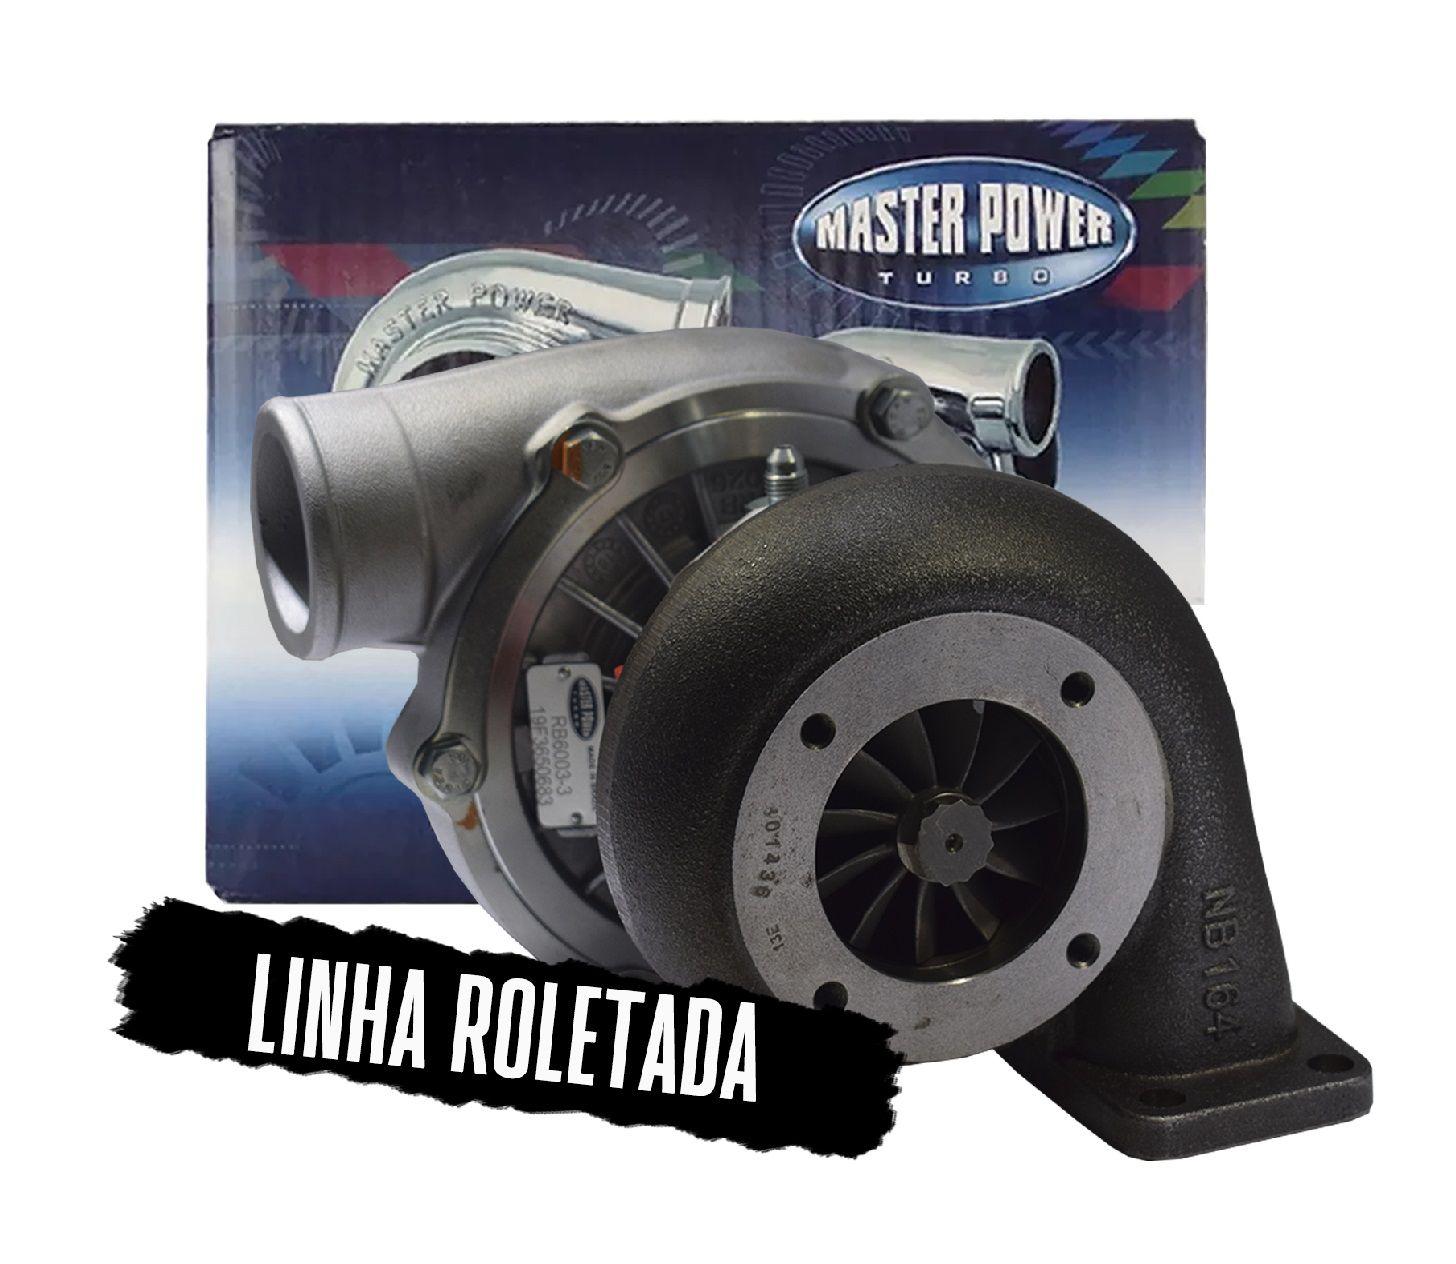 Turbina Roletada / Bearing Master Power - RB5449